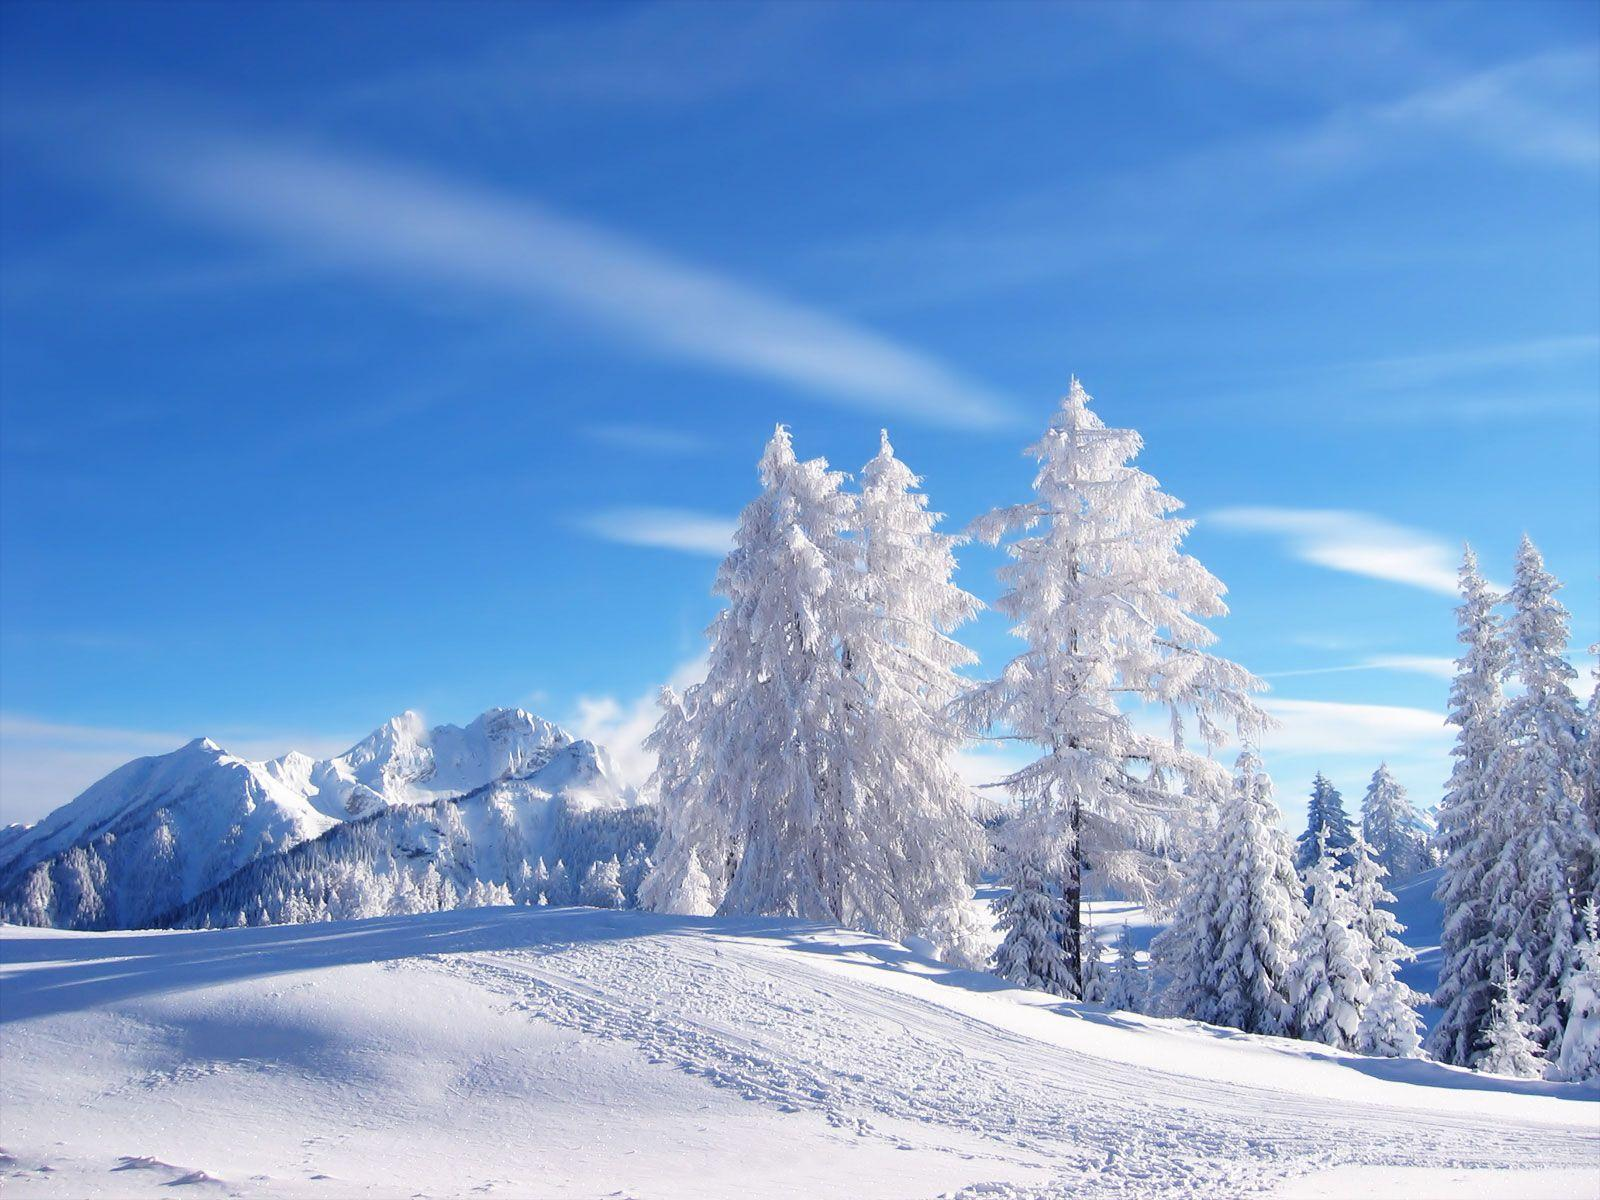 Snowy scenes wallpapers wallpaper cave winter scene wallpapers voltagebd Image collections